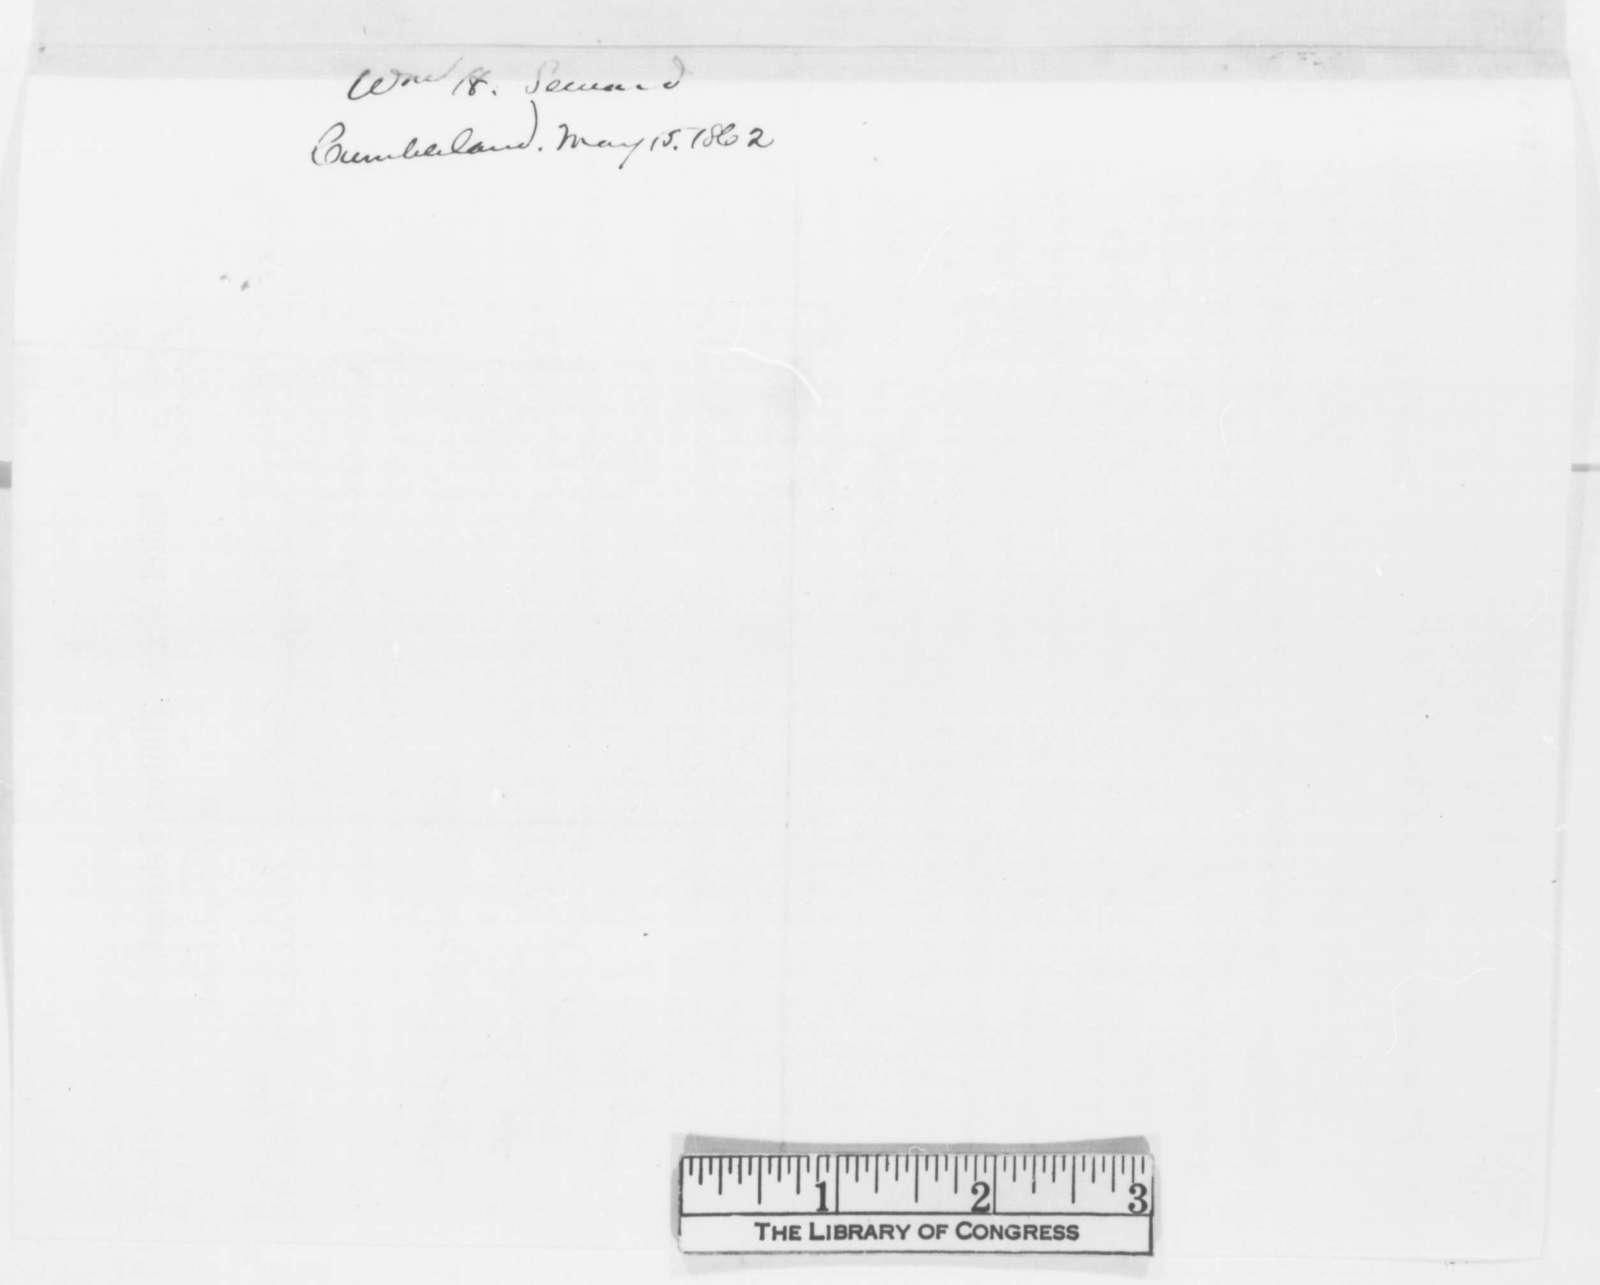 William H. Seward to Abraham Lincoln, Wednesday, May 14, 1862  (Telegram regarding military affairs)